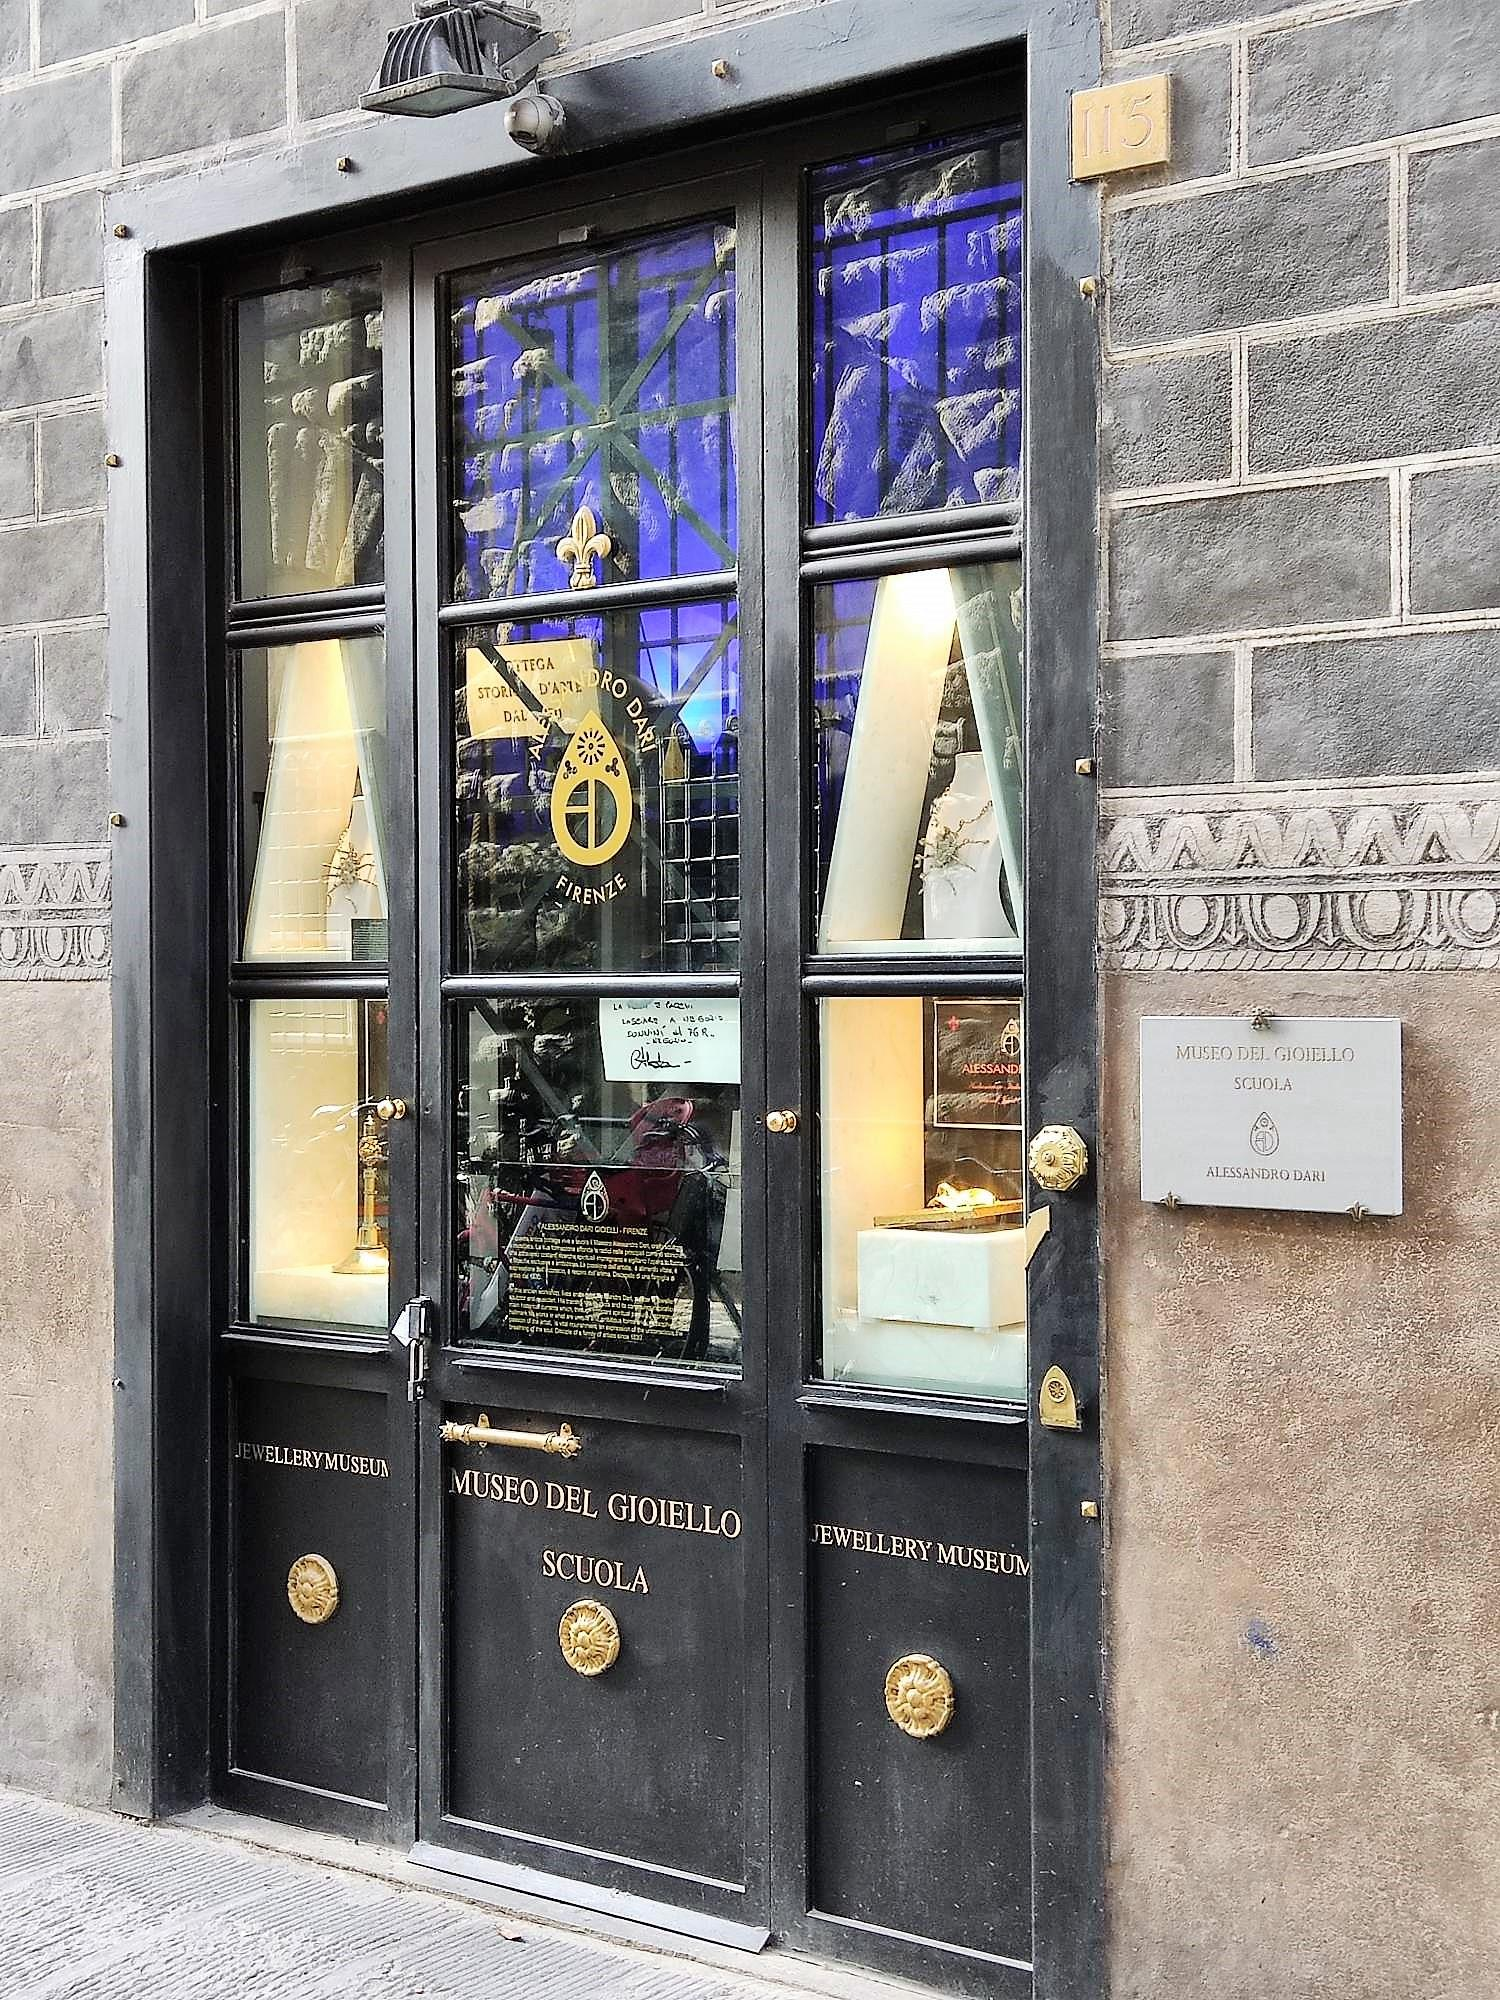 Free-tour-Florencia-al-Amanecer-6